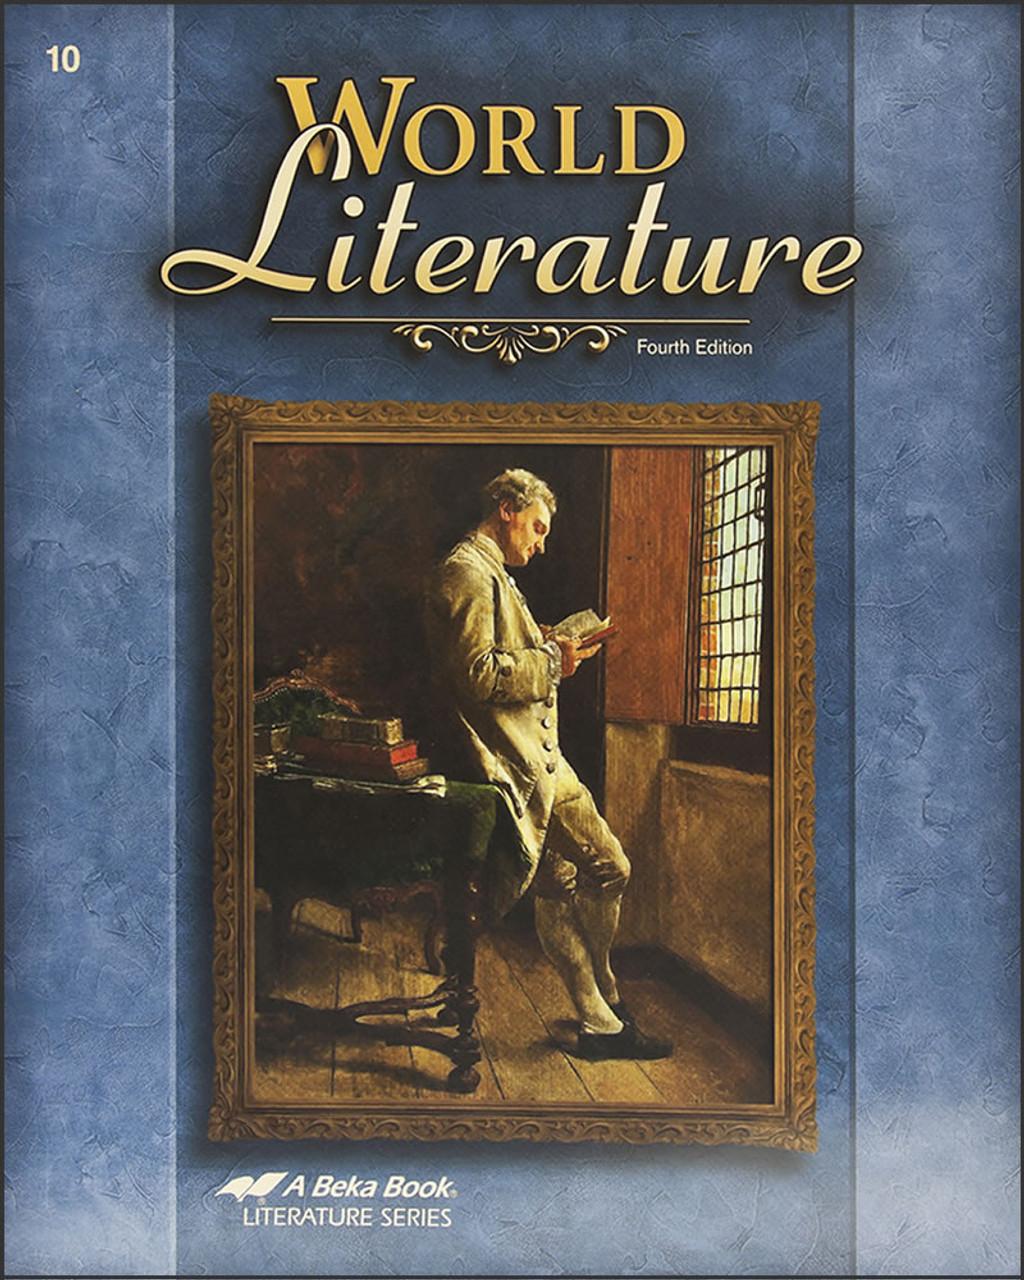 World Literature, 4th edition (second half)